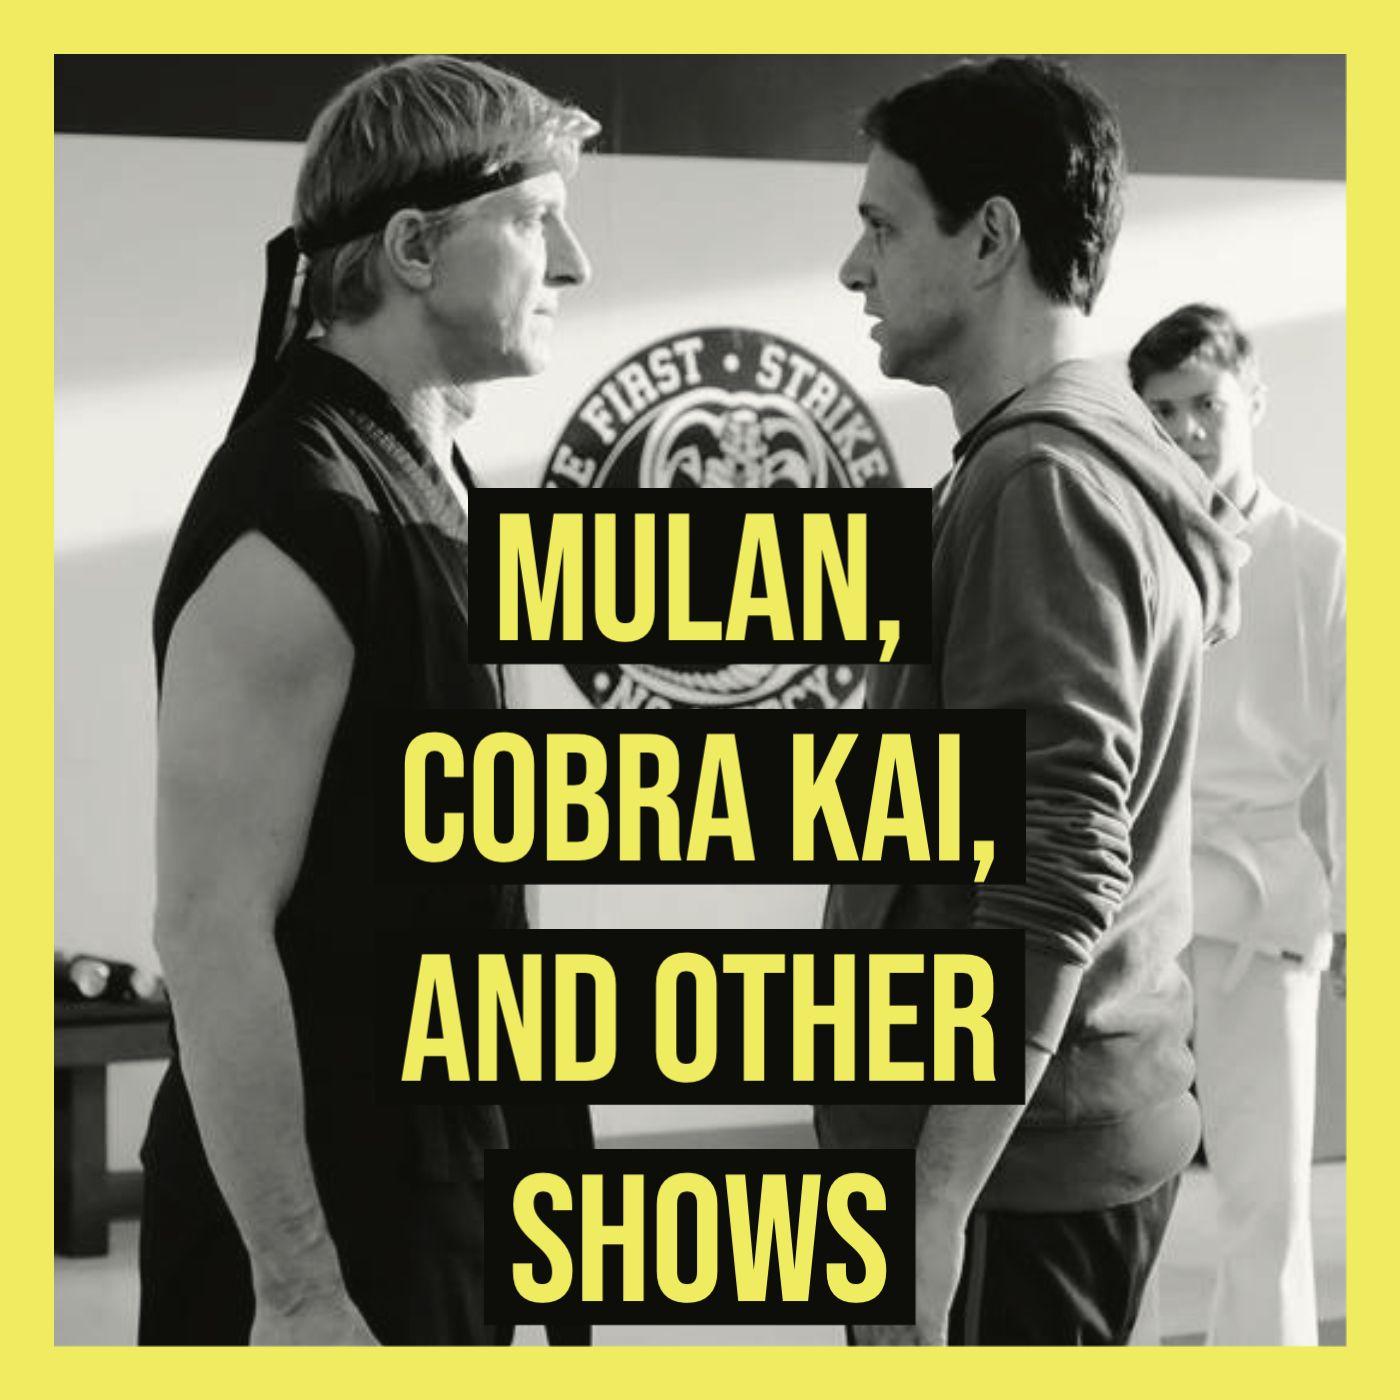 Mulan, Cobra Kai, and Other Shows